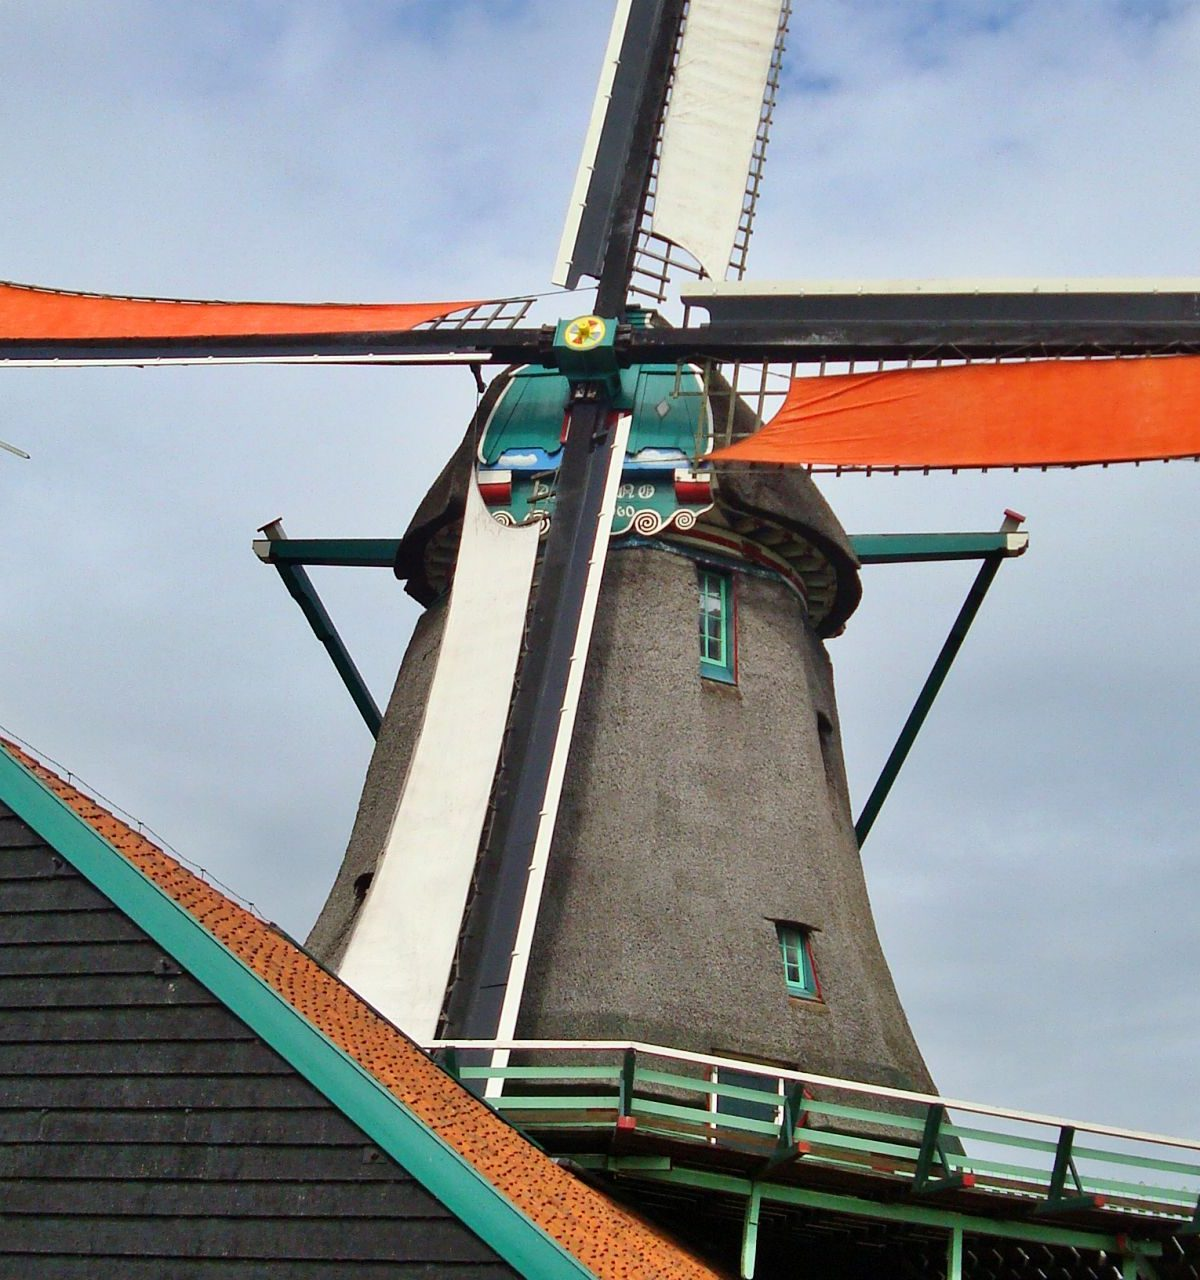 zaanse schans molen noord holland hotelb&b lanormande-08